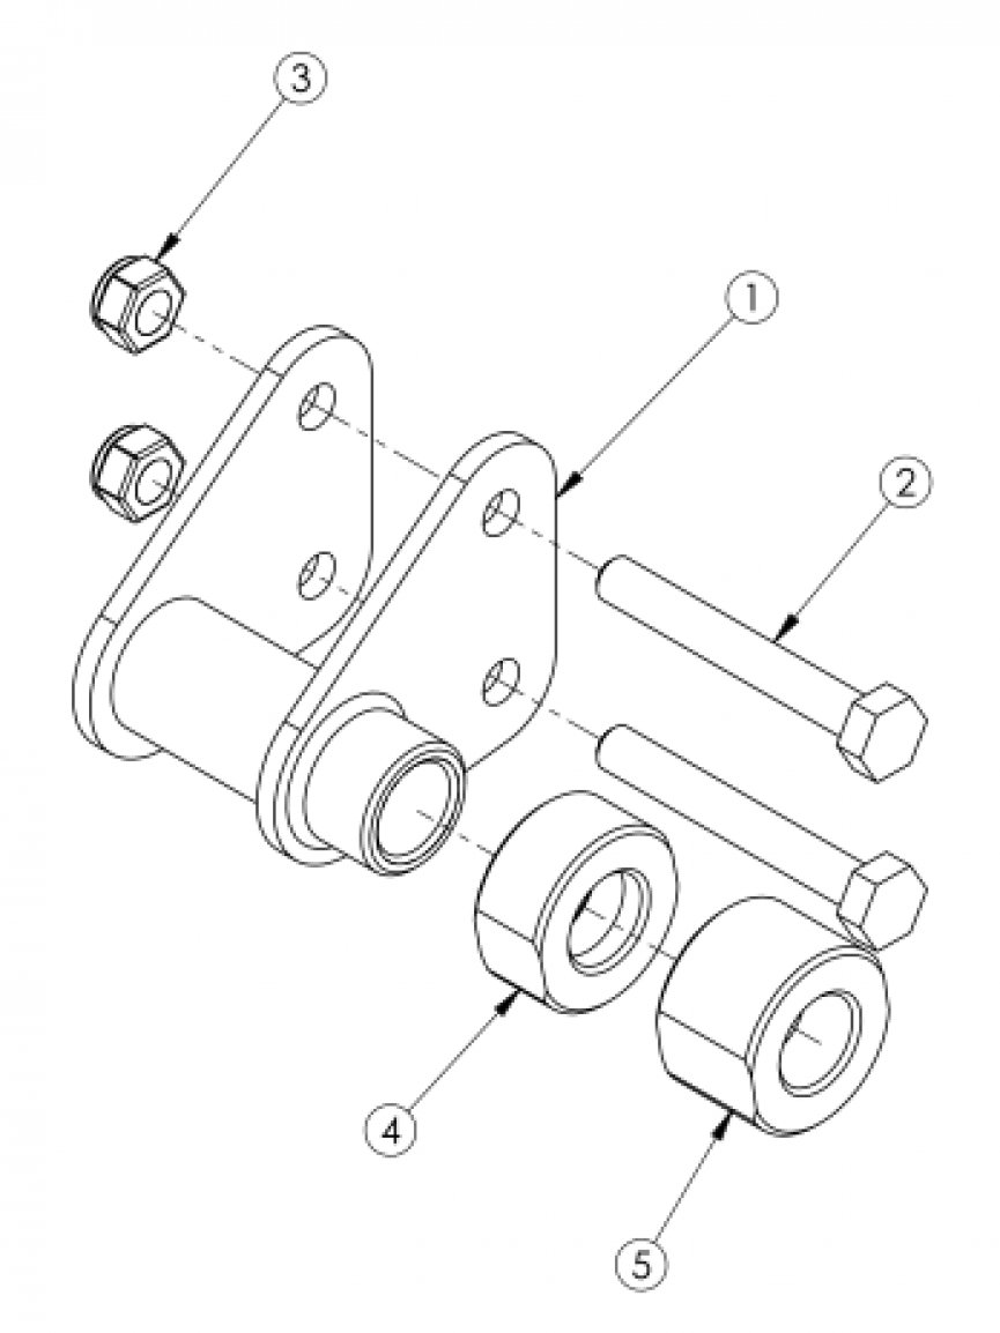 Catalyst 4 Axle Bracket parts diagram